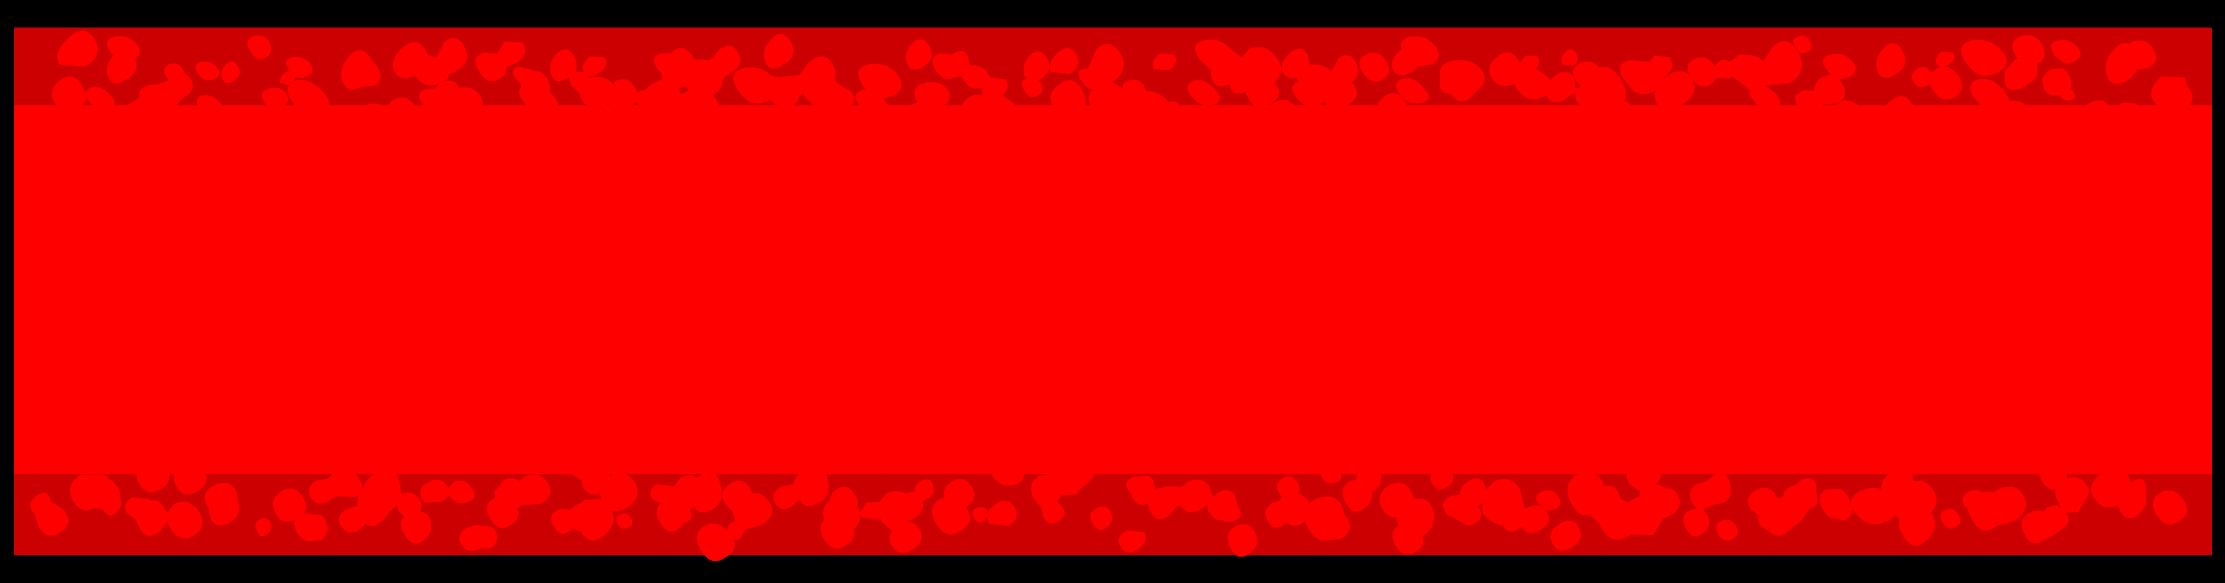 2225x583 Image